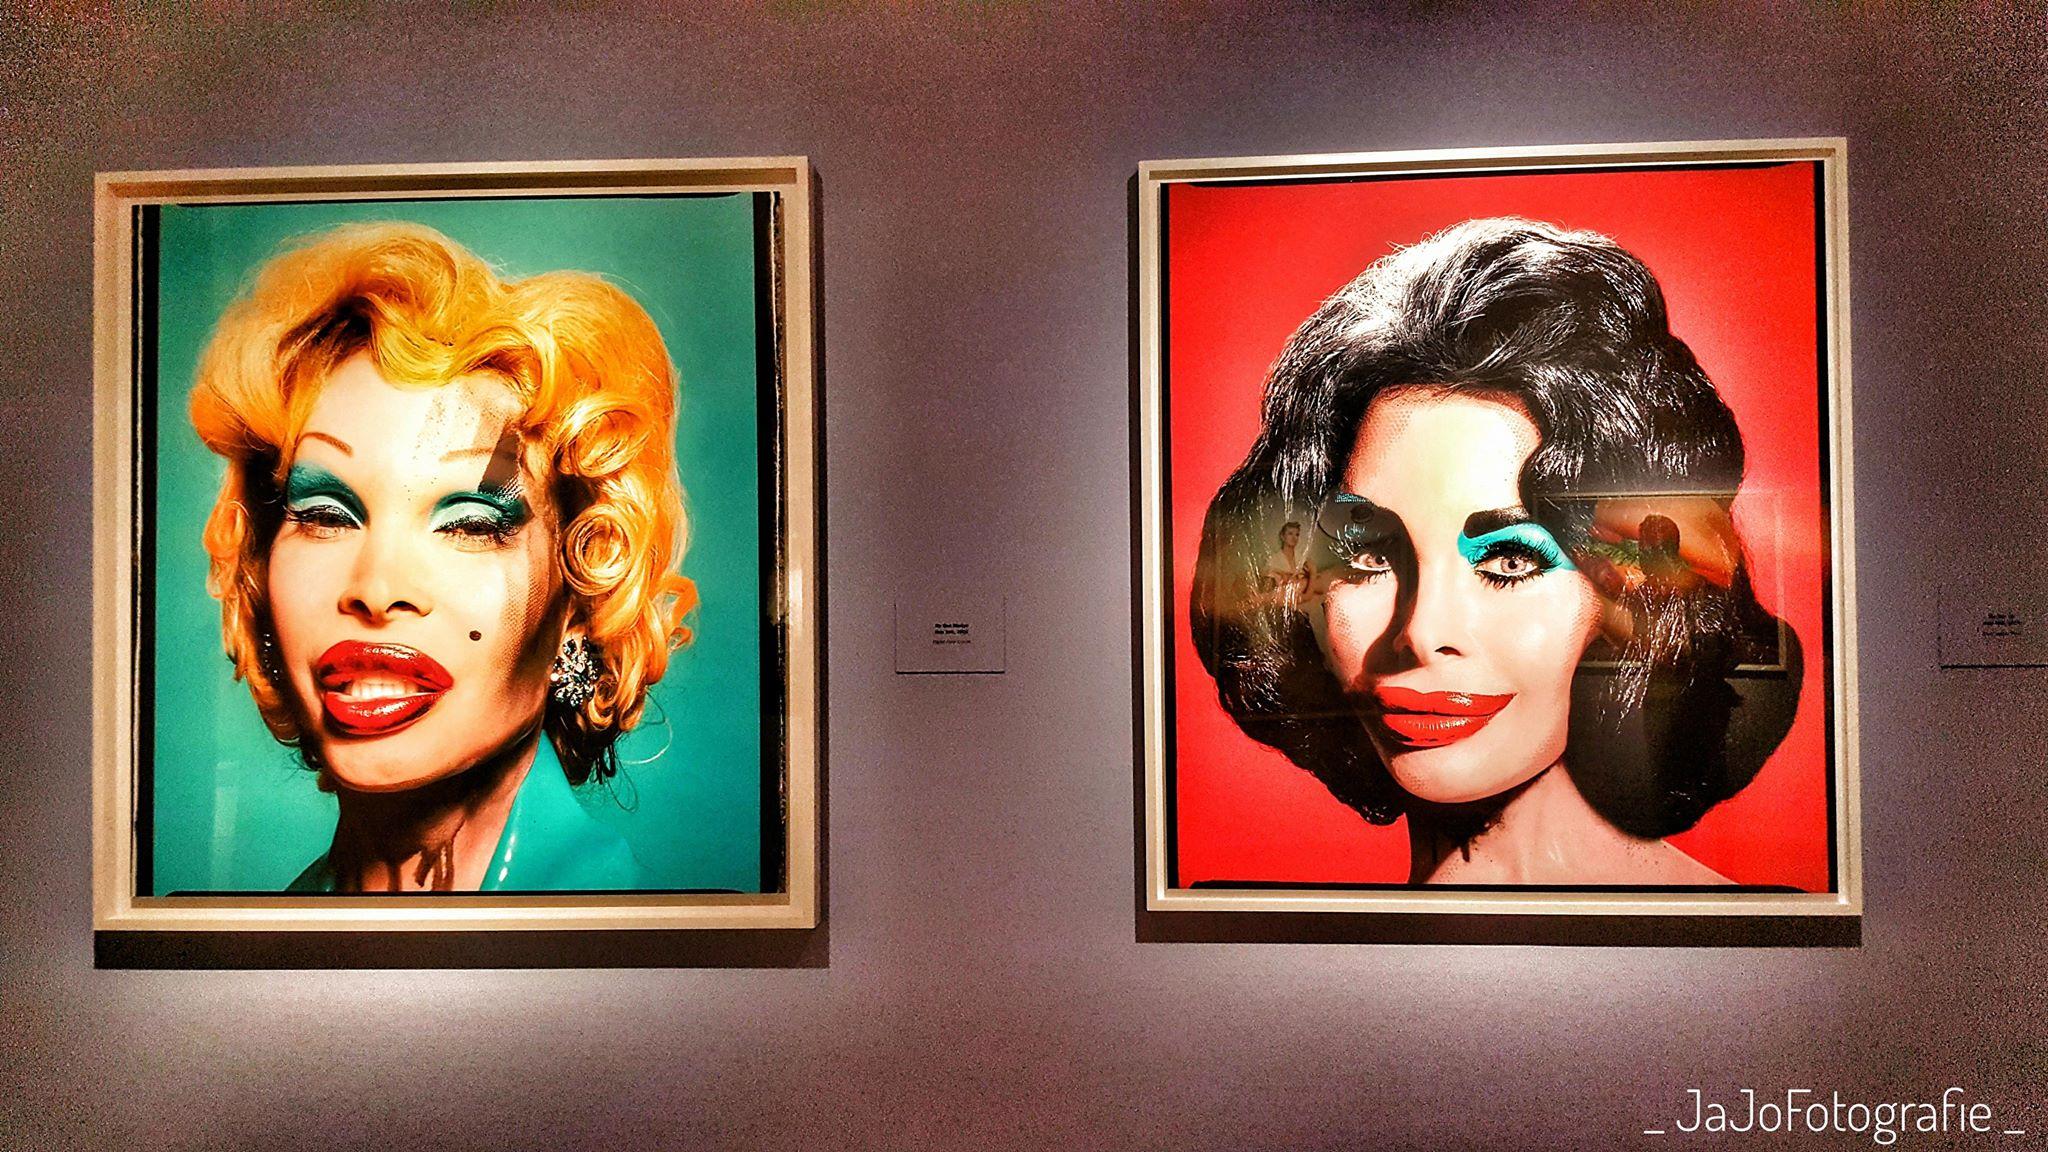 Marilyn, Liz, David LaChapelle, Fotograaf, Fotografie, Kunst, Art, Artist.